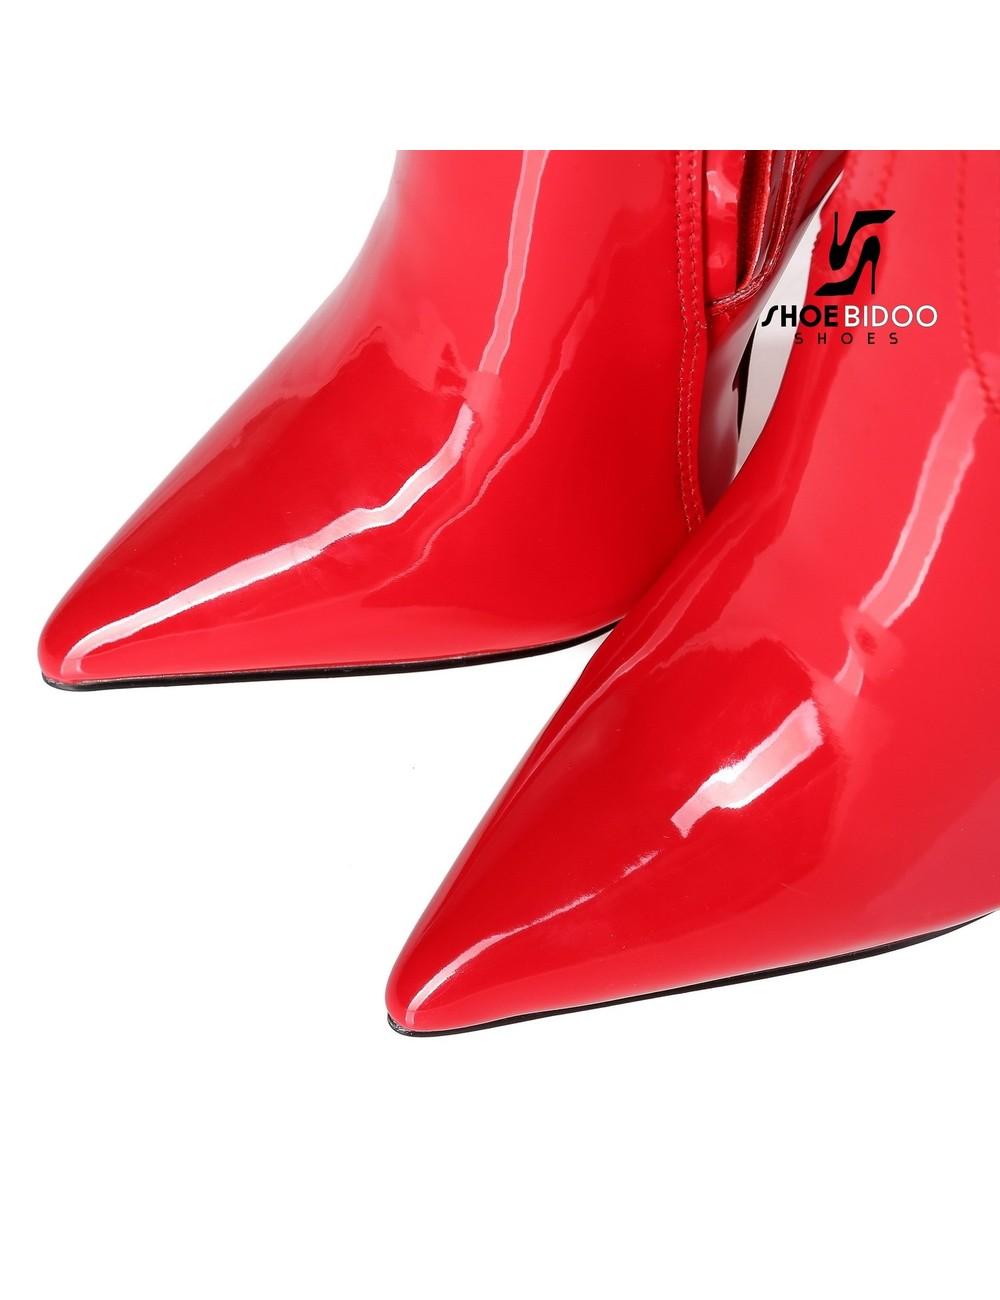 Giaro Giaro Mode Kniestiefel TAKEN in rotem Patent